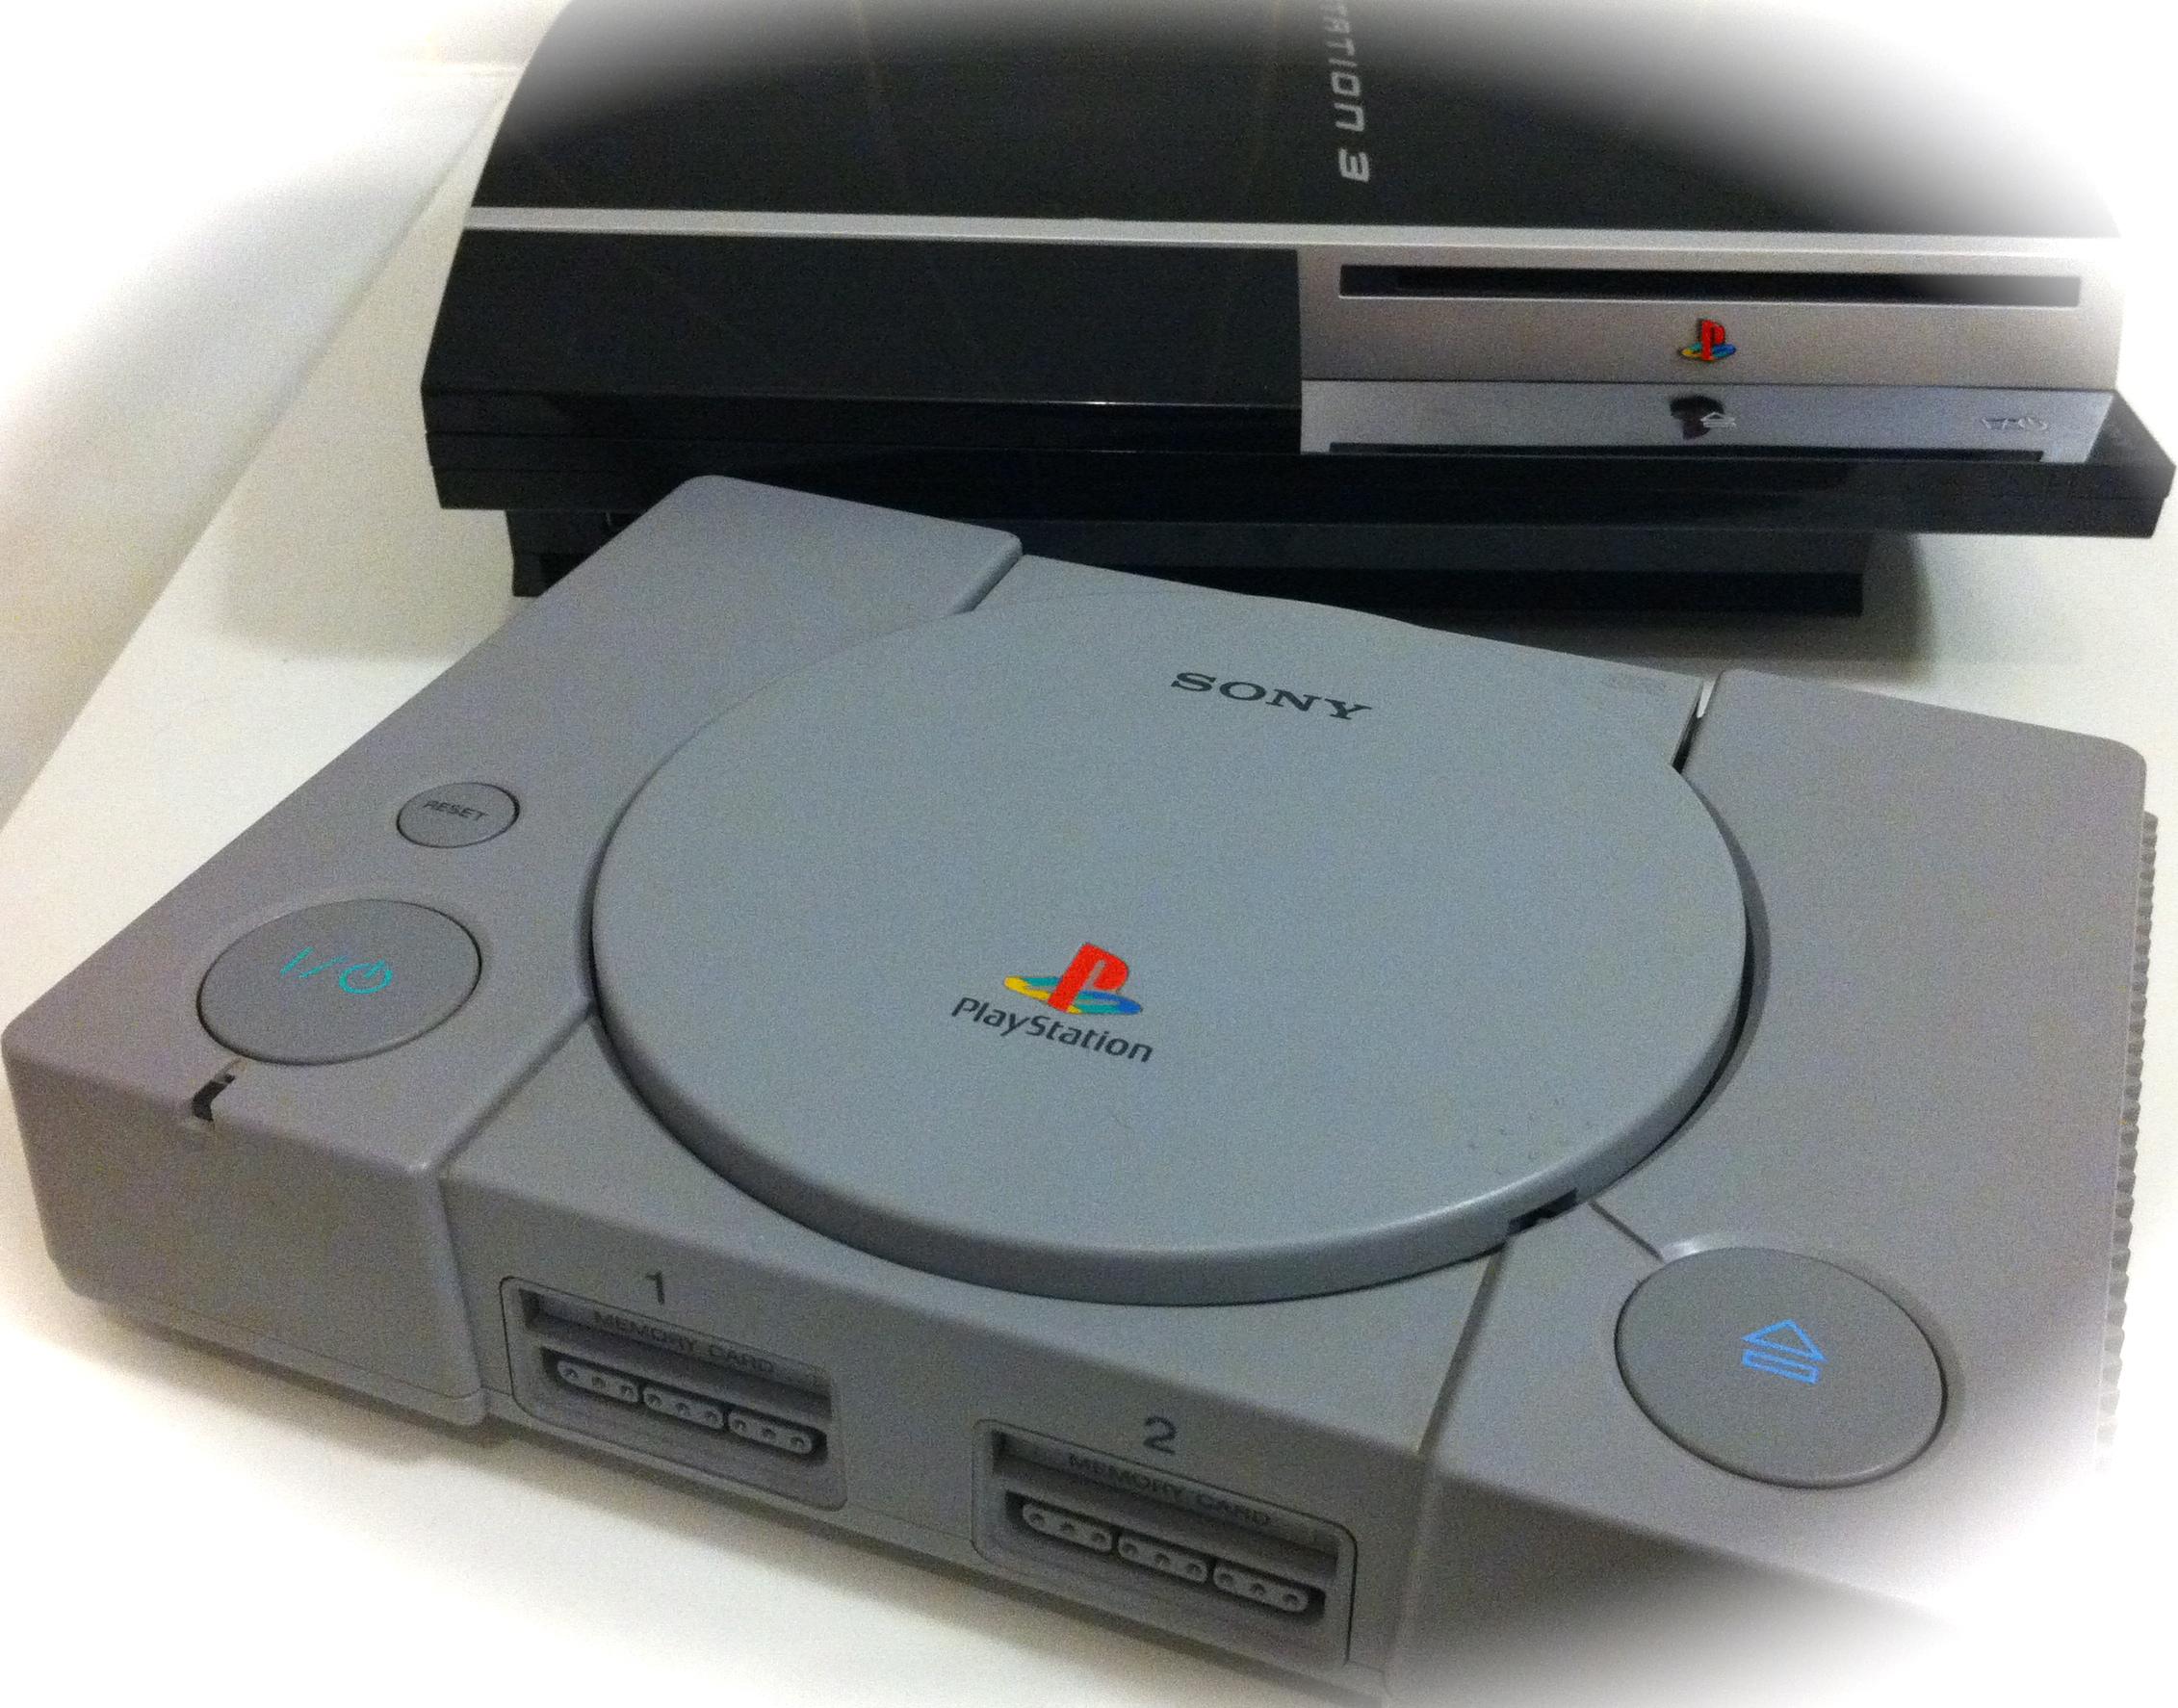 Playstation 1 et 3 de Sony